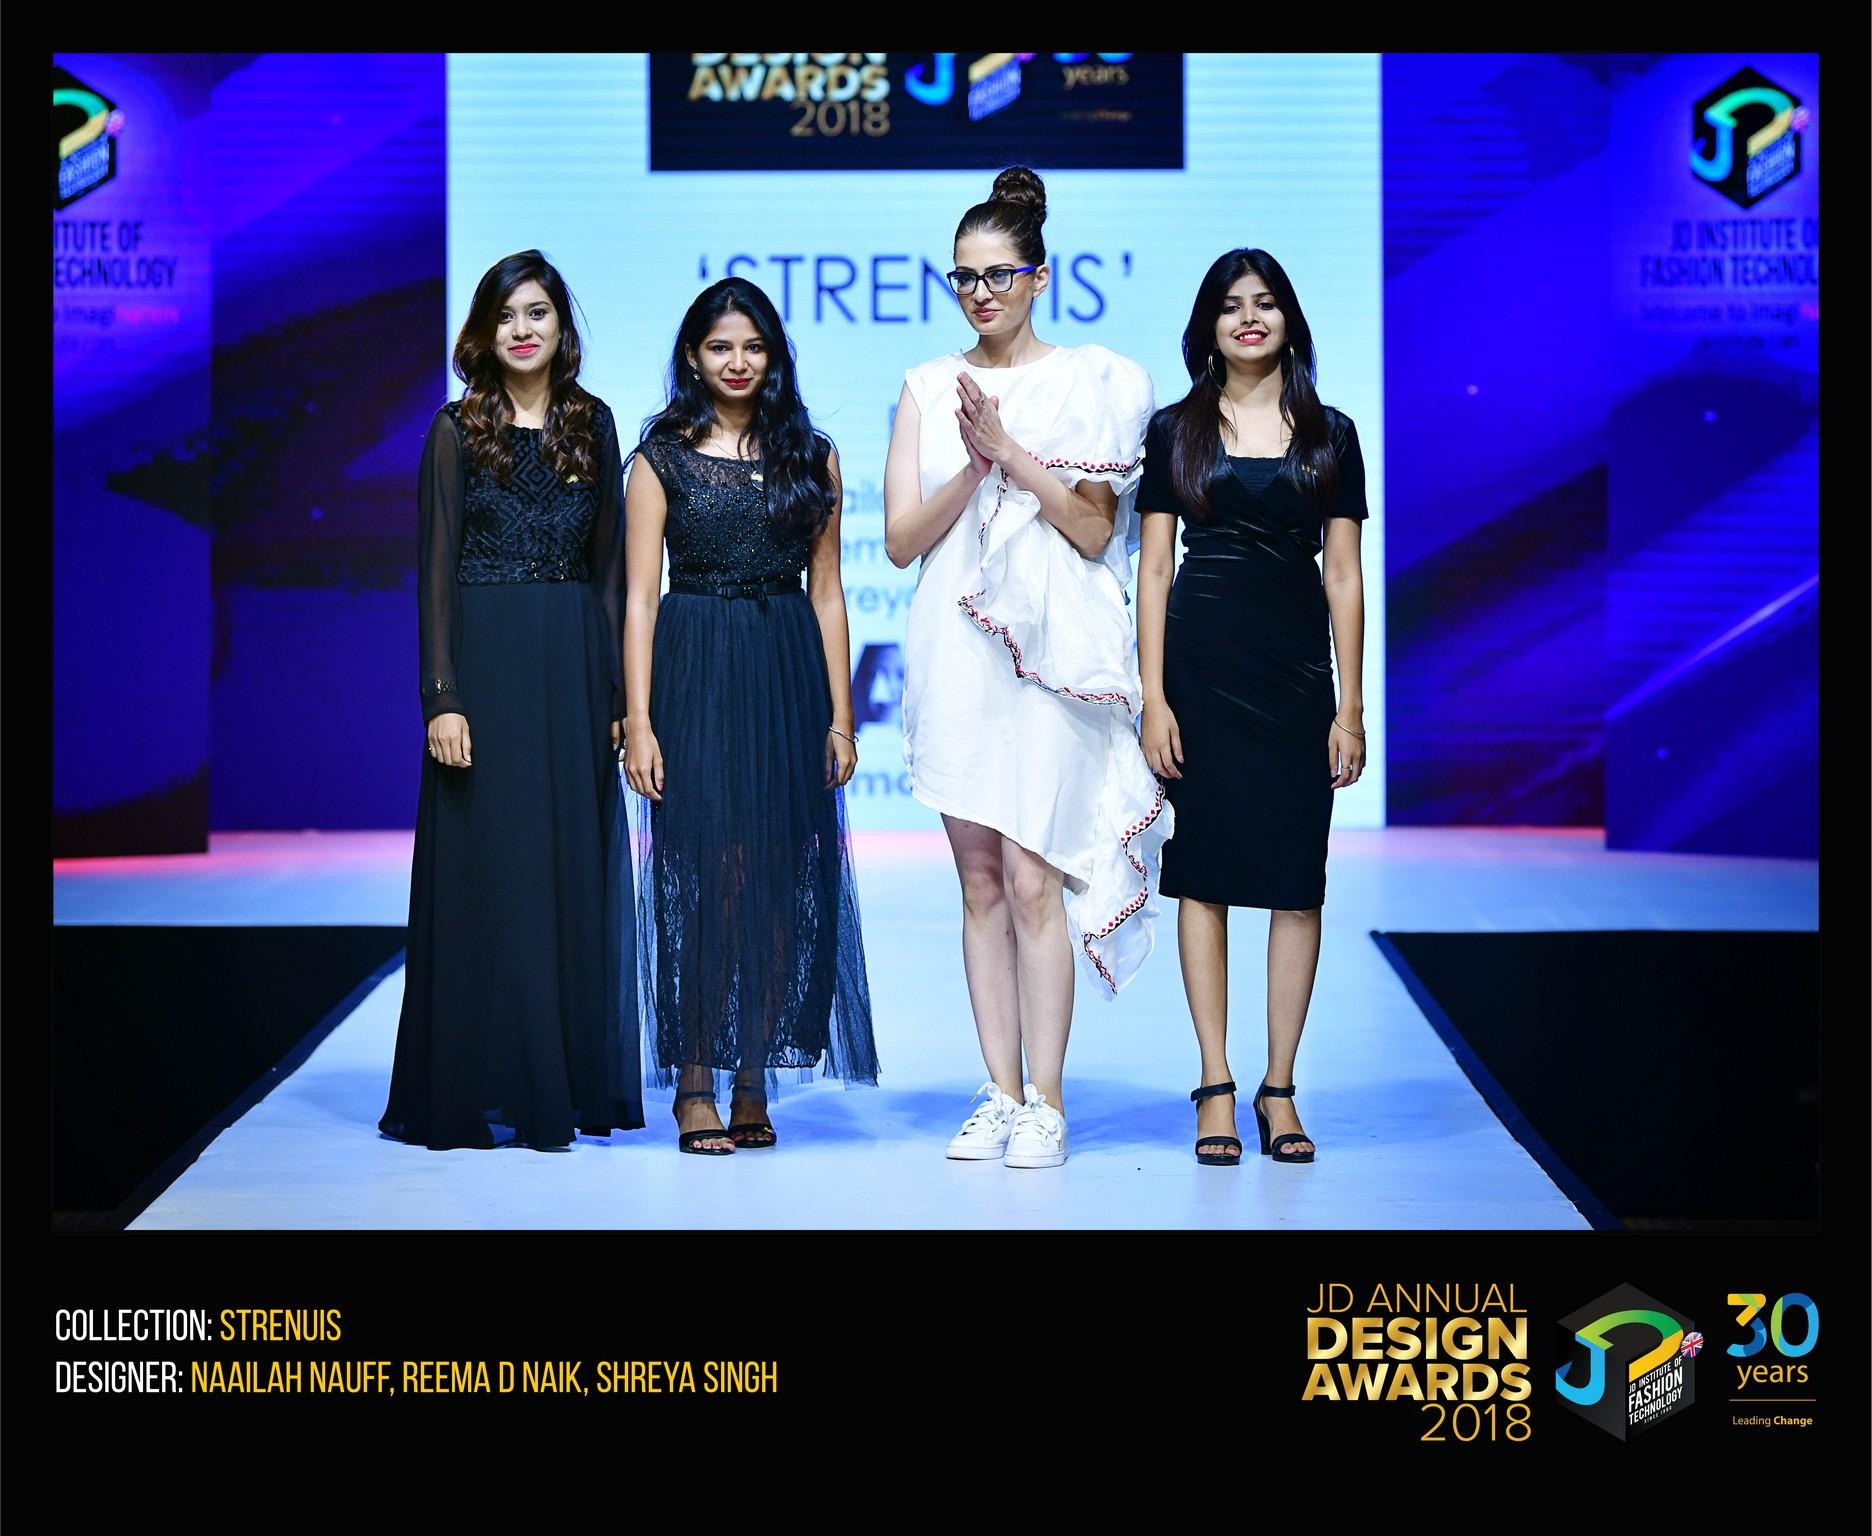 Strenuis – Change – JD Annual Design Awards 2018 | Designer: Naailah, Reema, Shreya | Photography : Jerin Nath (@jerin_nath) strenuis - STRENUIS 8 - Strenuis – Change – JD Annual Design Awards 2018